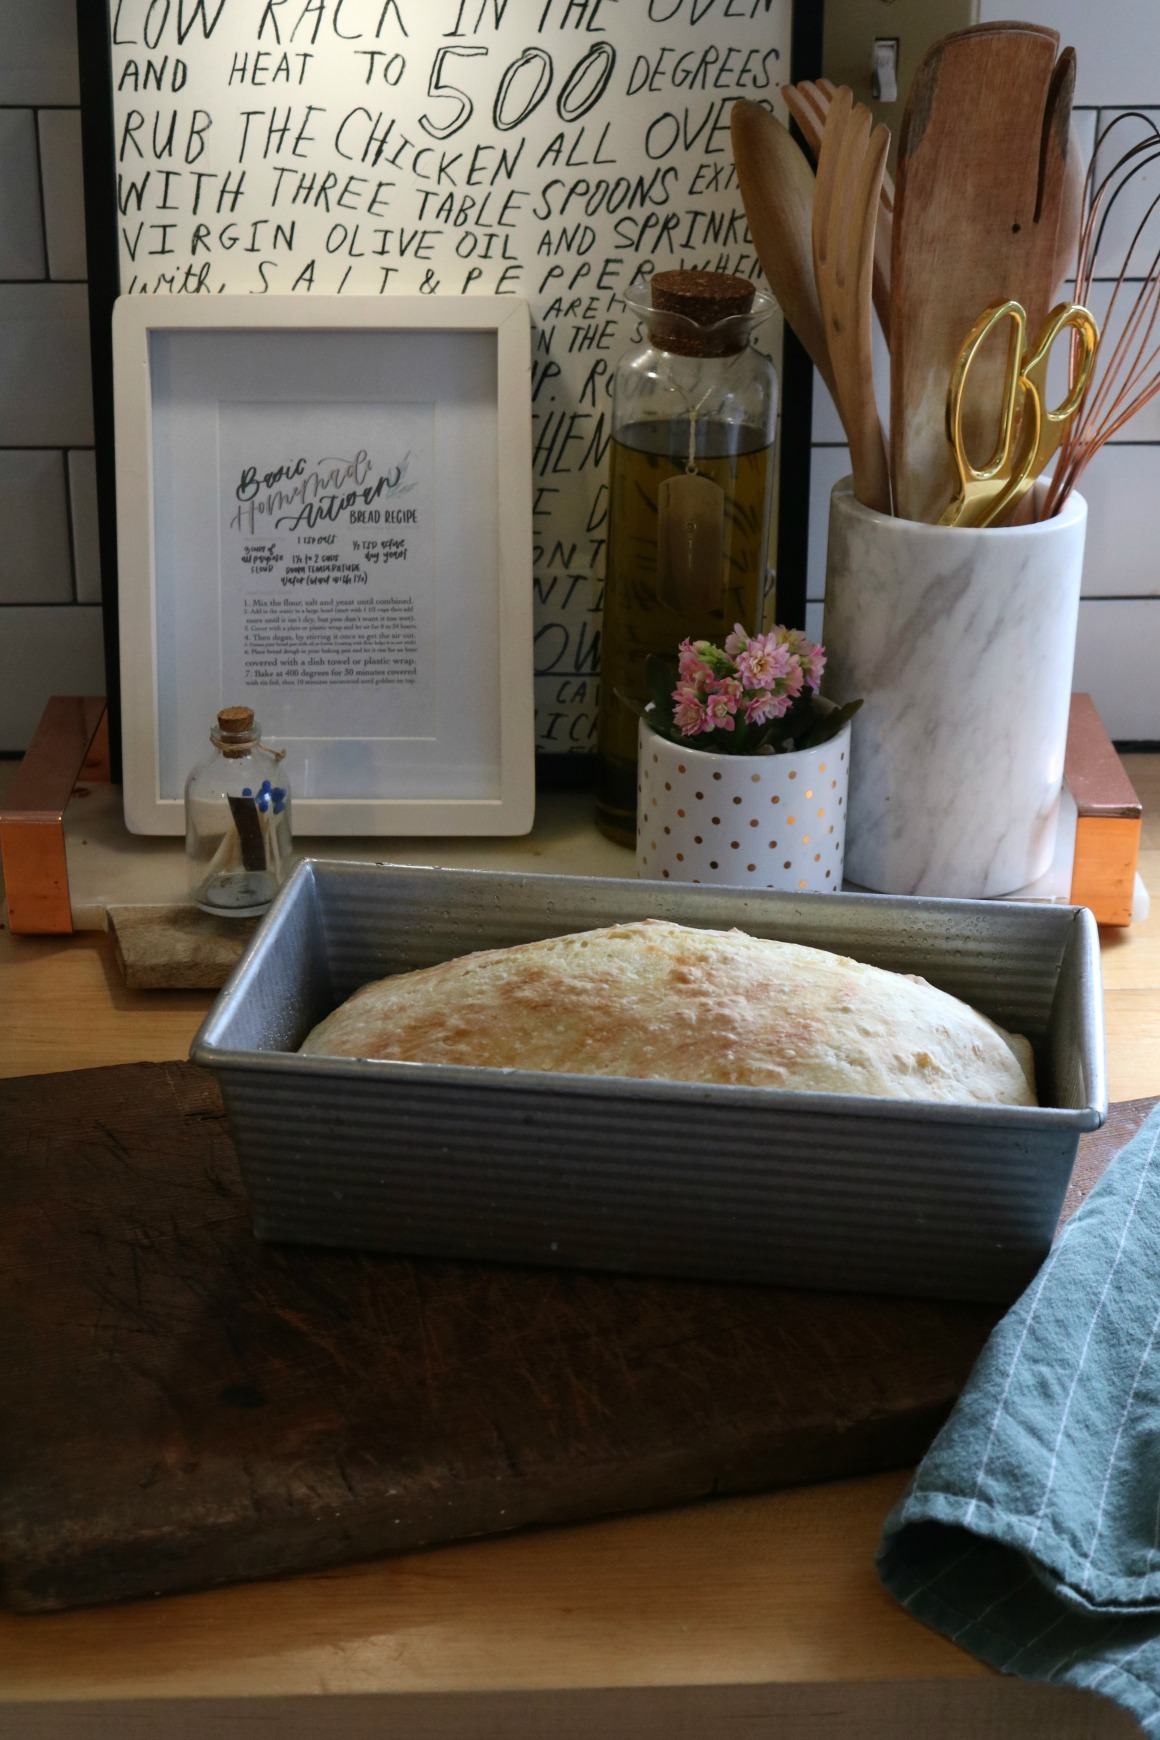 Best Pan for Baking Bread